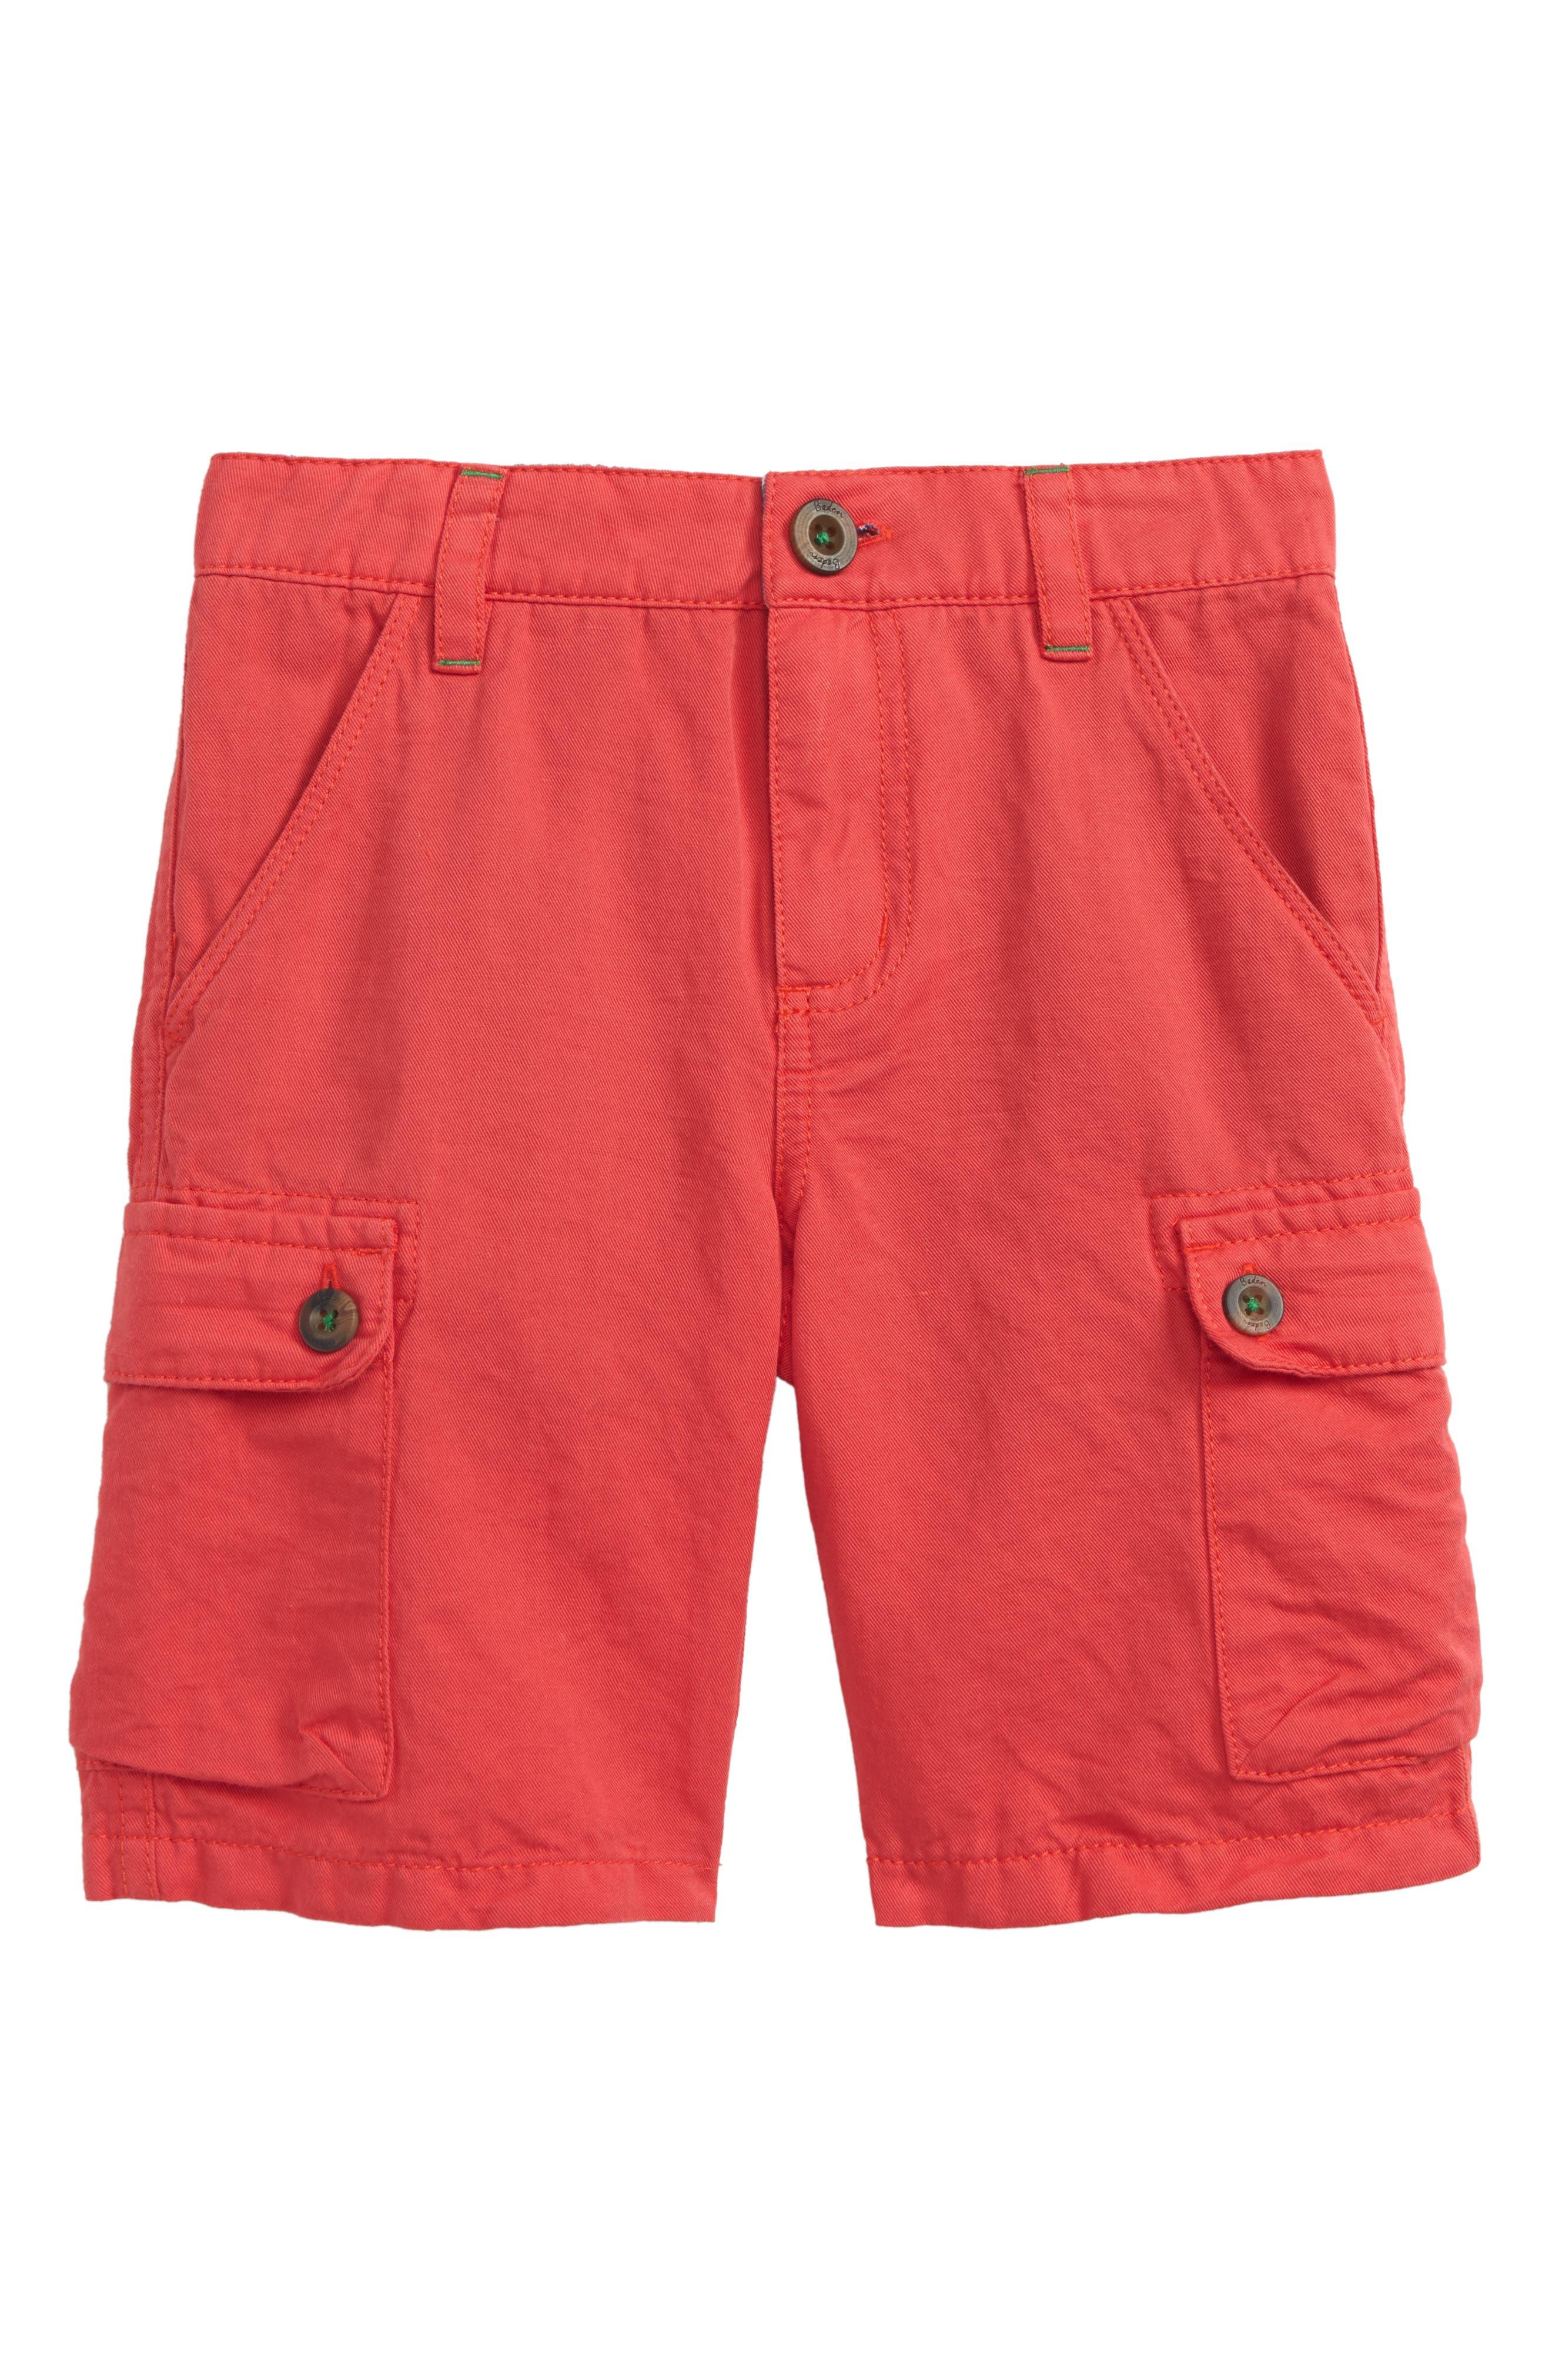 Summer Cargo Shorts,                             Main thumbnail 1, color,                             Jam Red